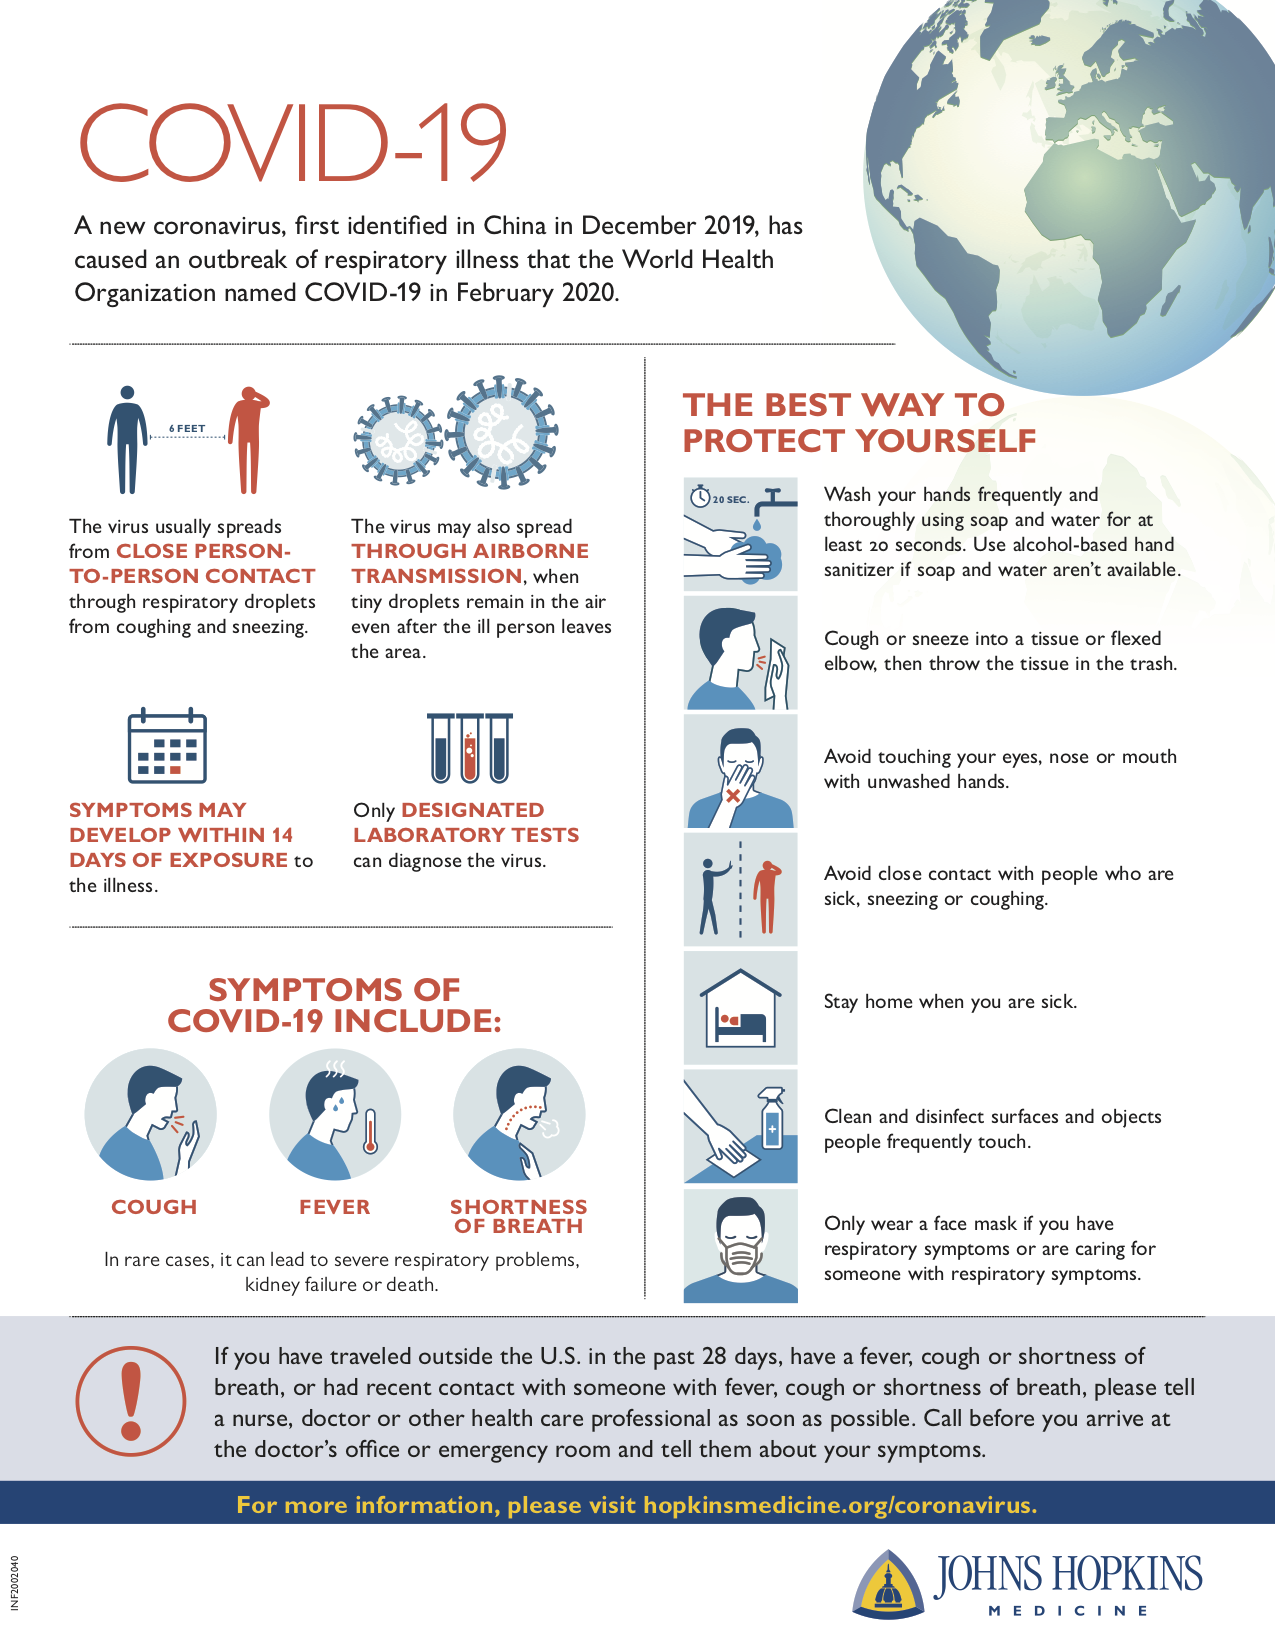 coronavirus covid-19 safety infographic